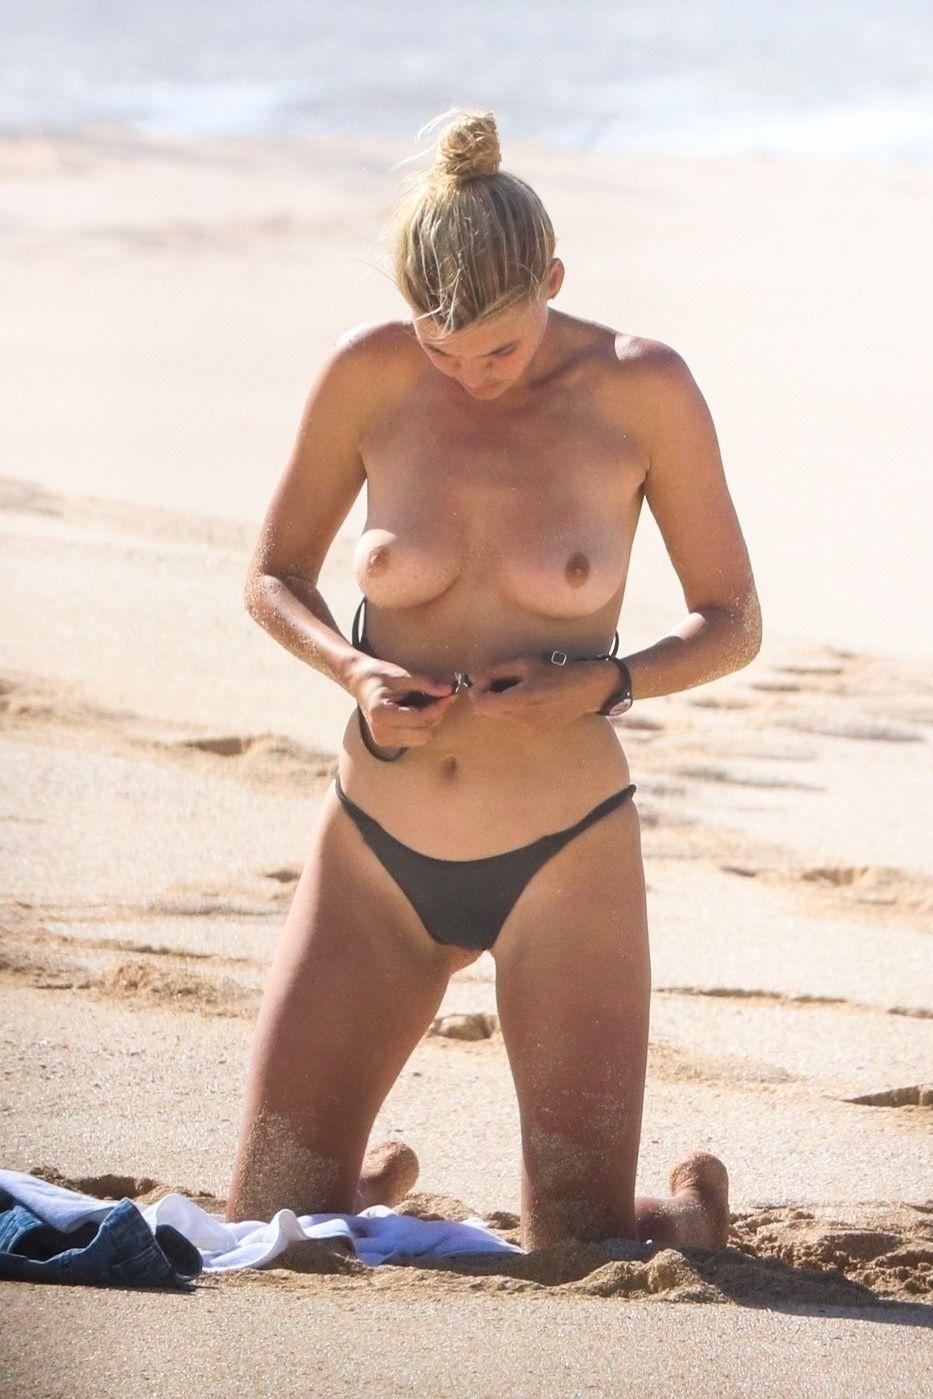 Porn Kelly Rohrbach nude photos 2019